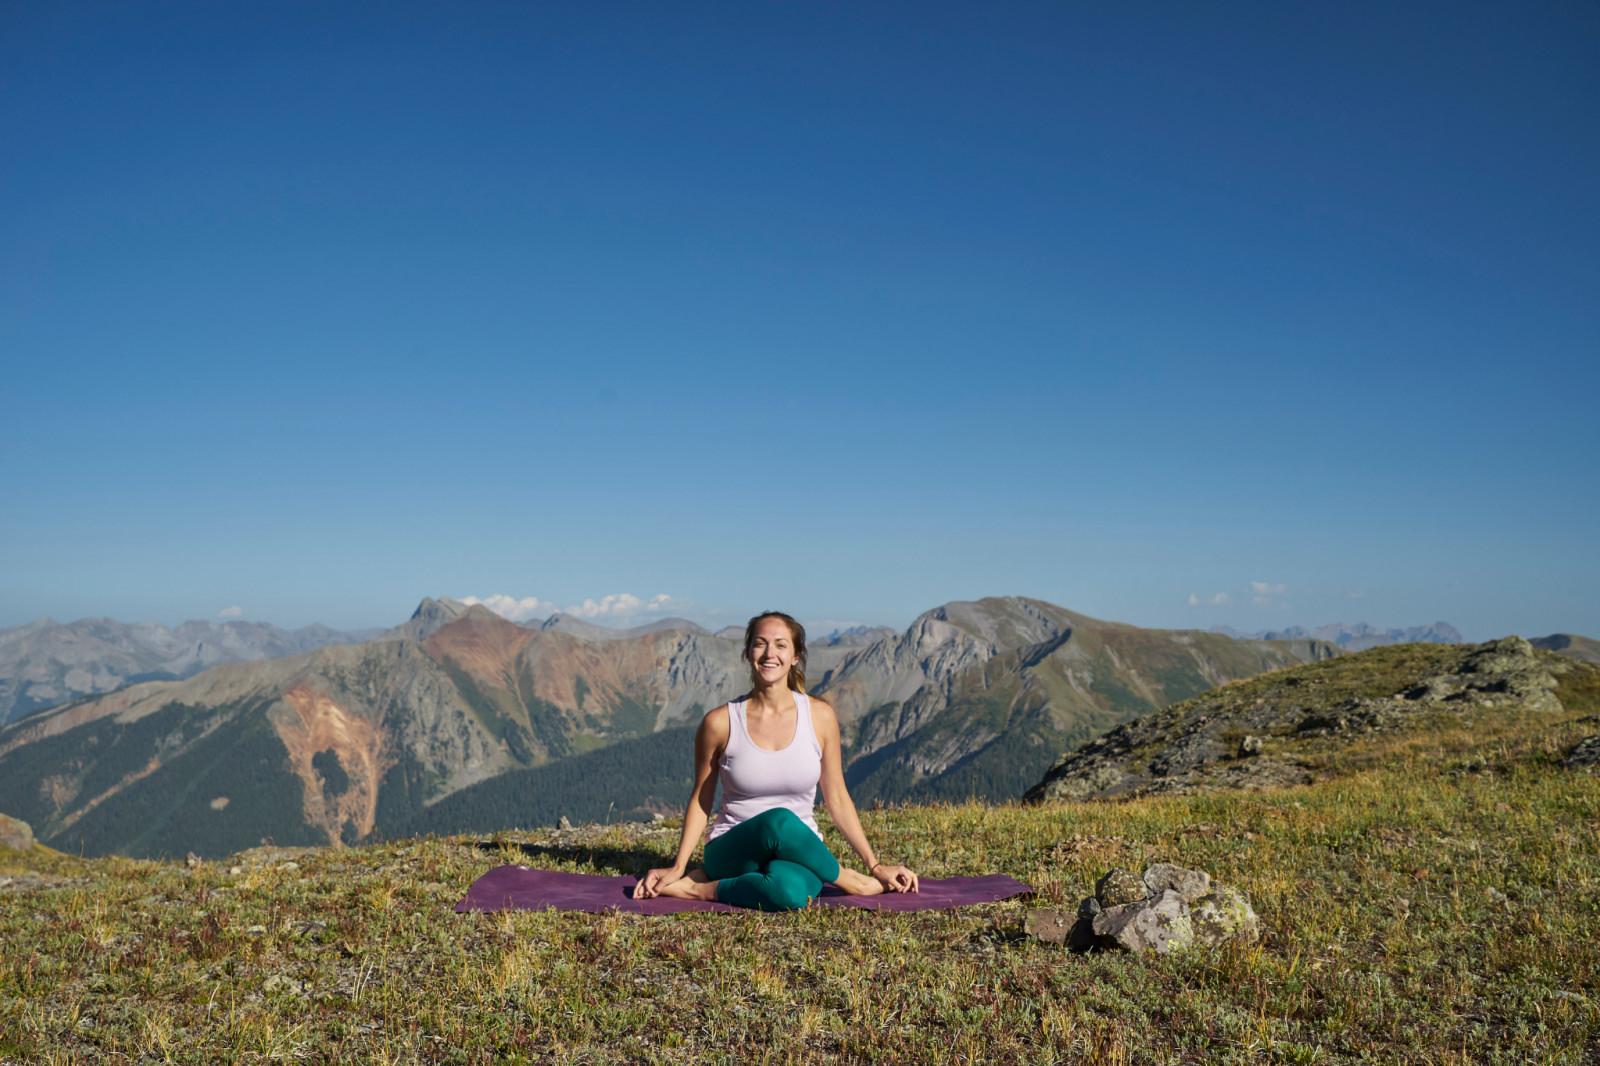 3 Benefits of Practicing Outdoor Yoga